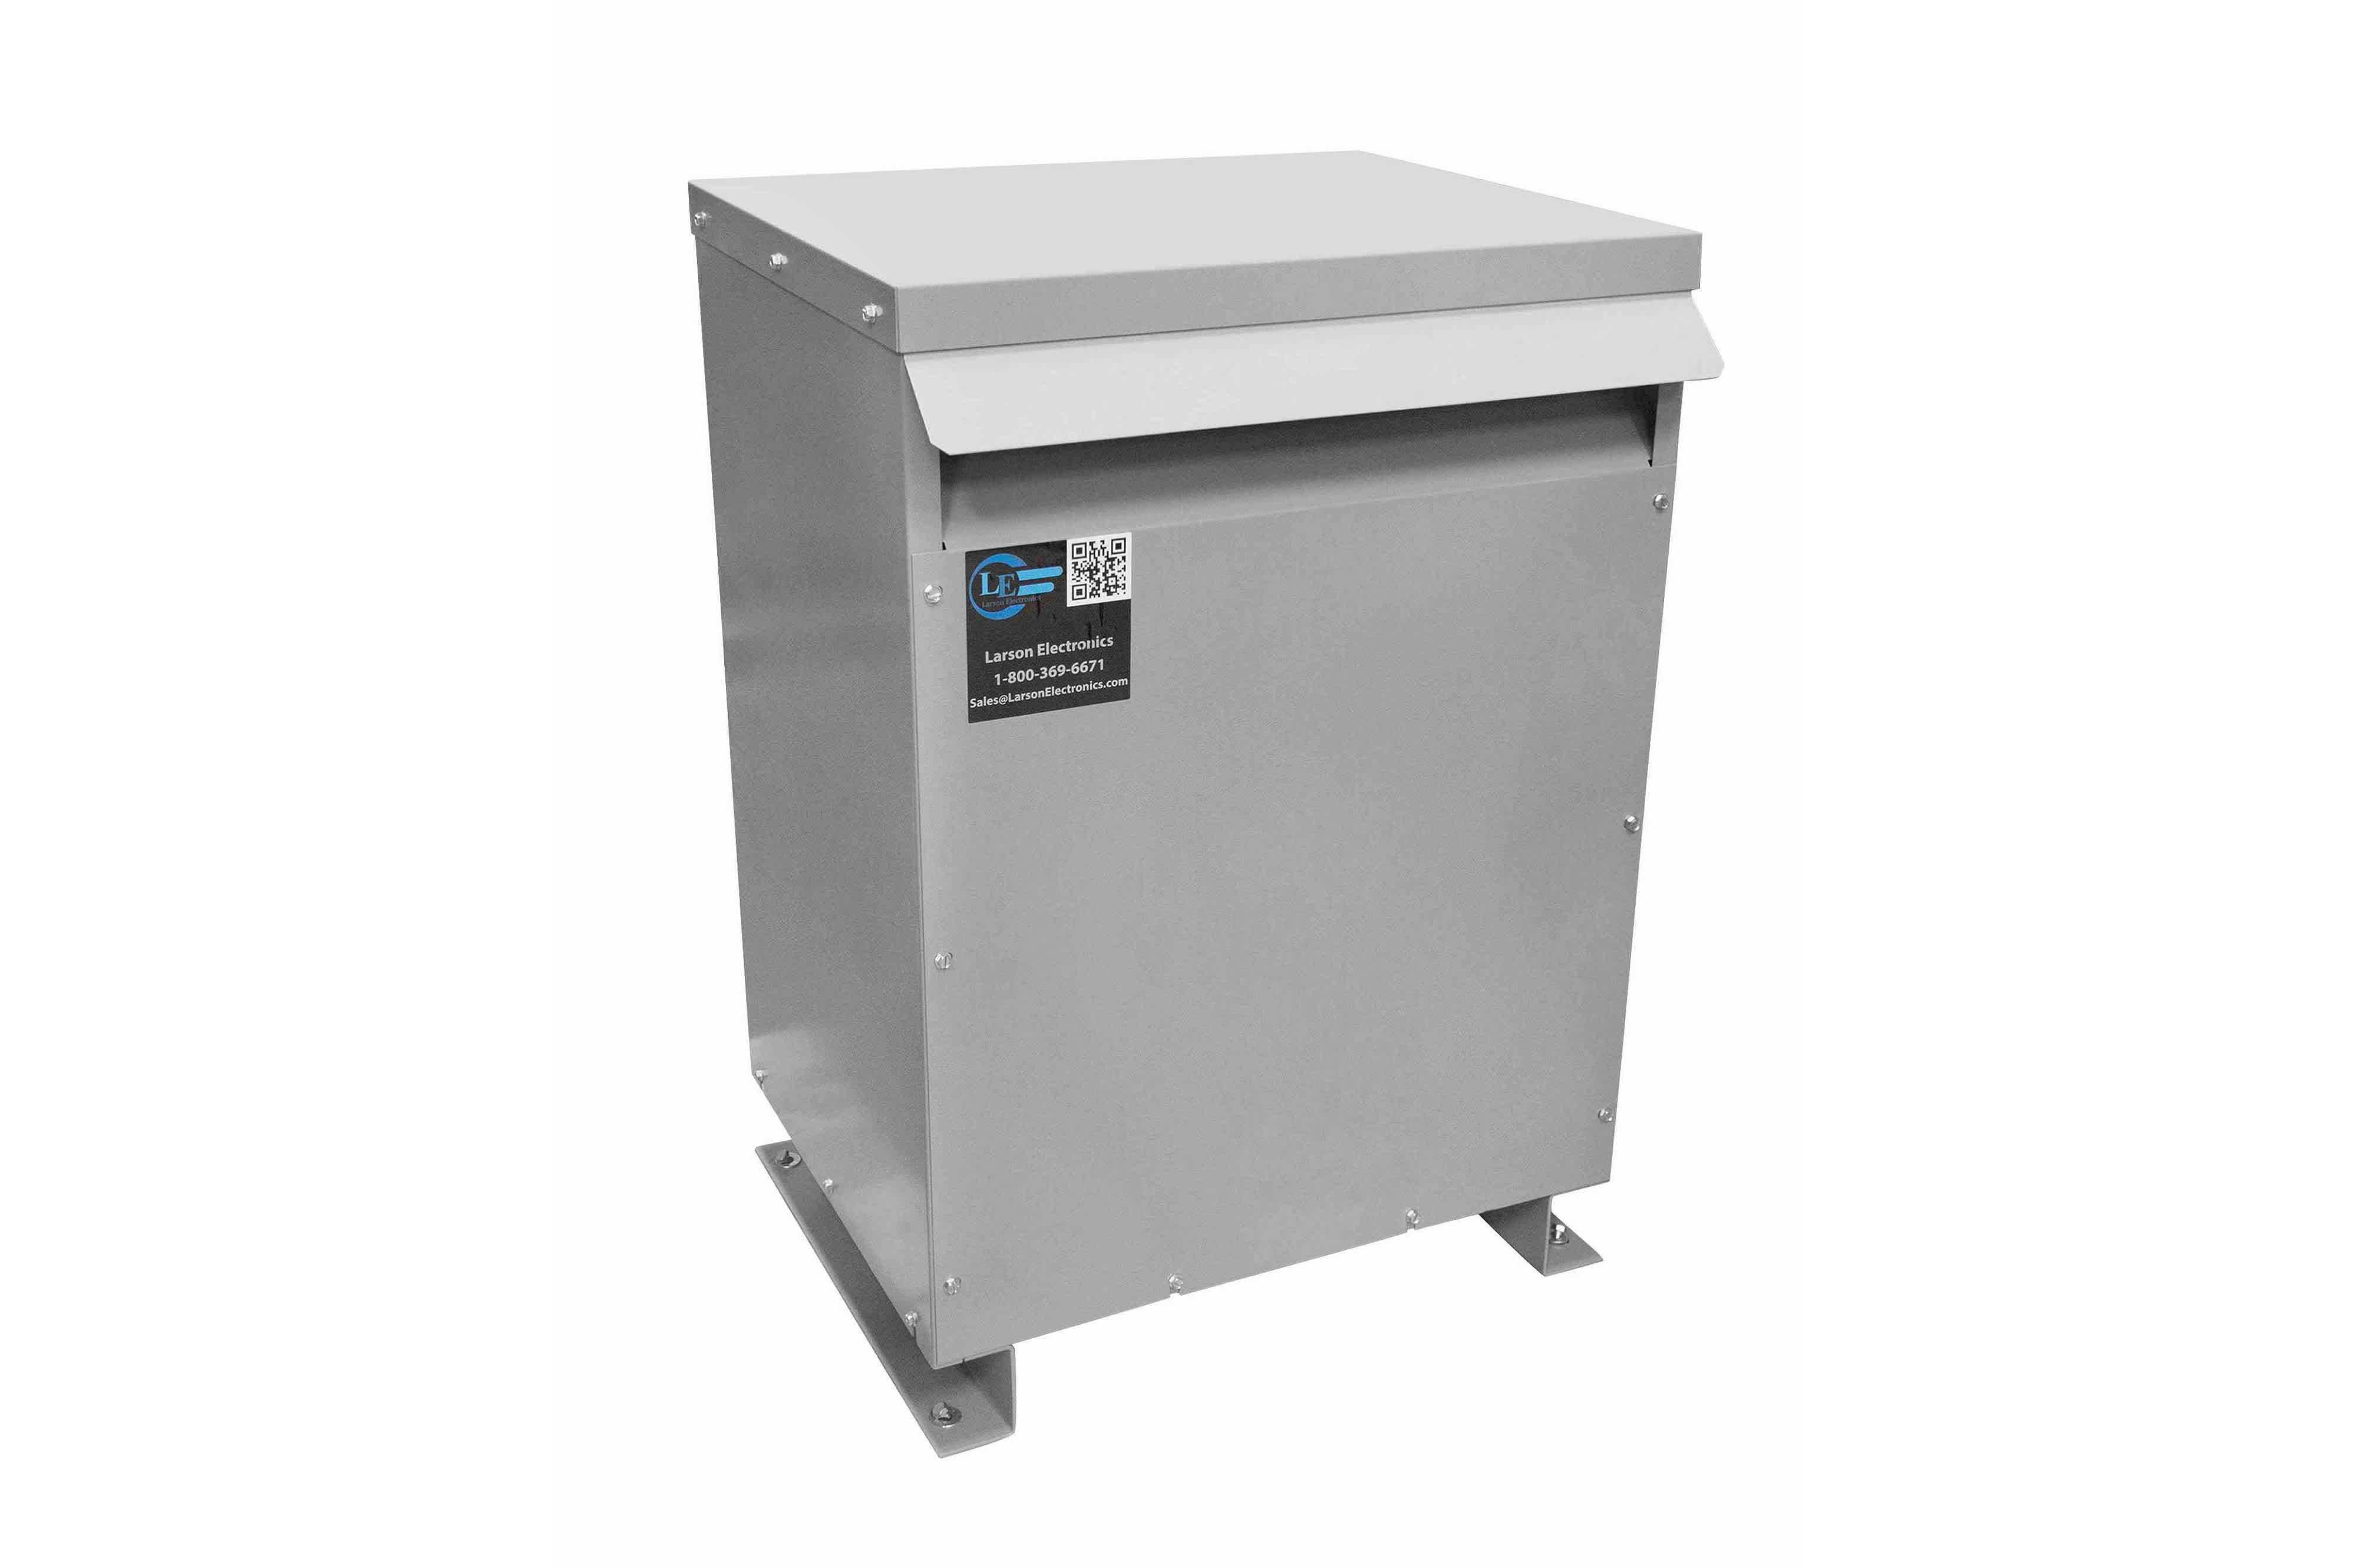 55 kVA 3PH Isolation Transformer, 600V Wye Primary, 480V Delta Secondary, N3R, Ventilated, 60 Hz